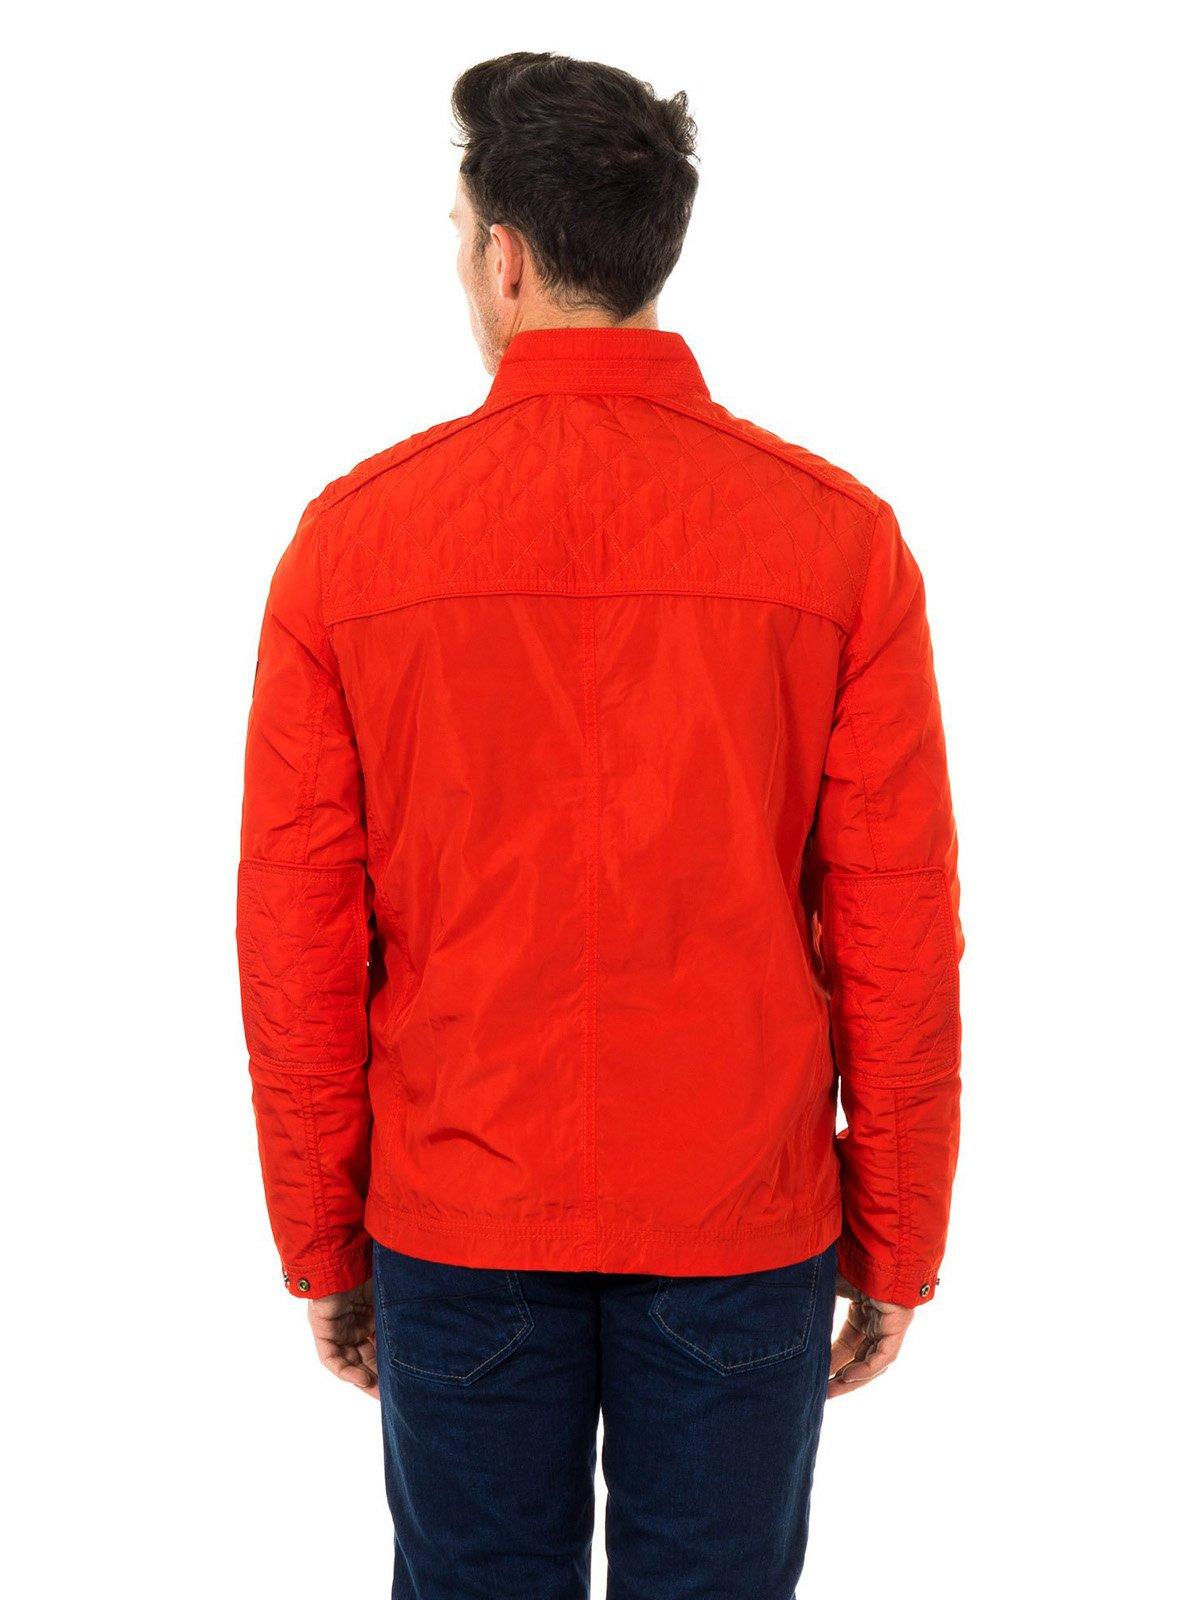 Куртка красная   2421241   фото 3